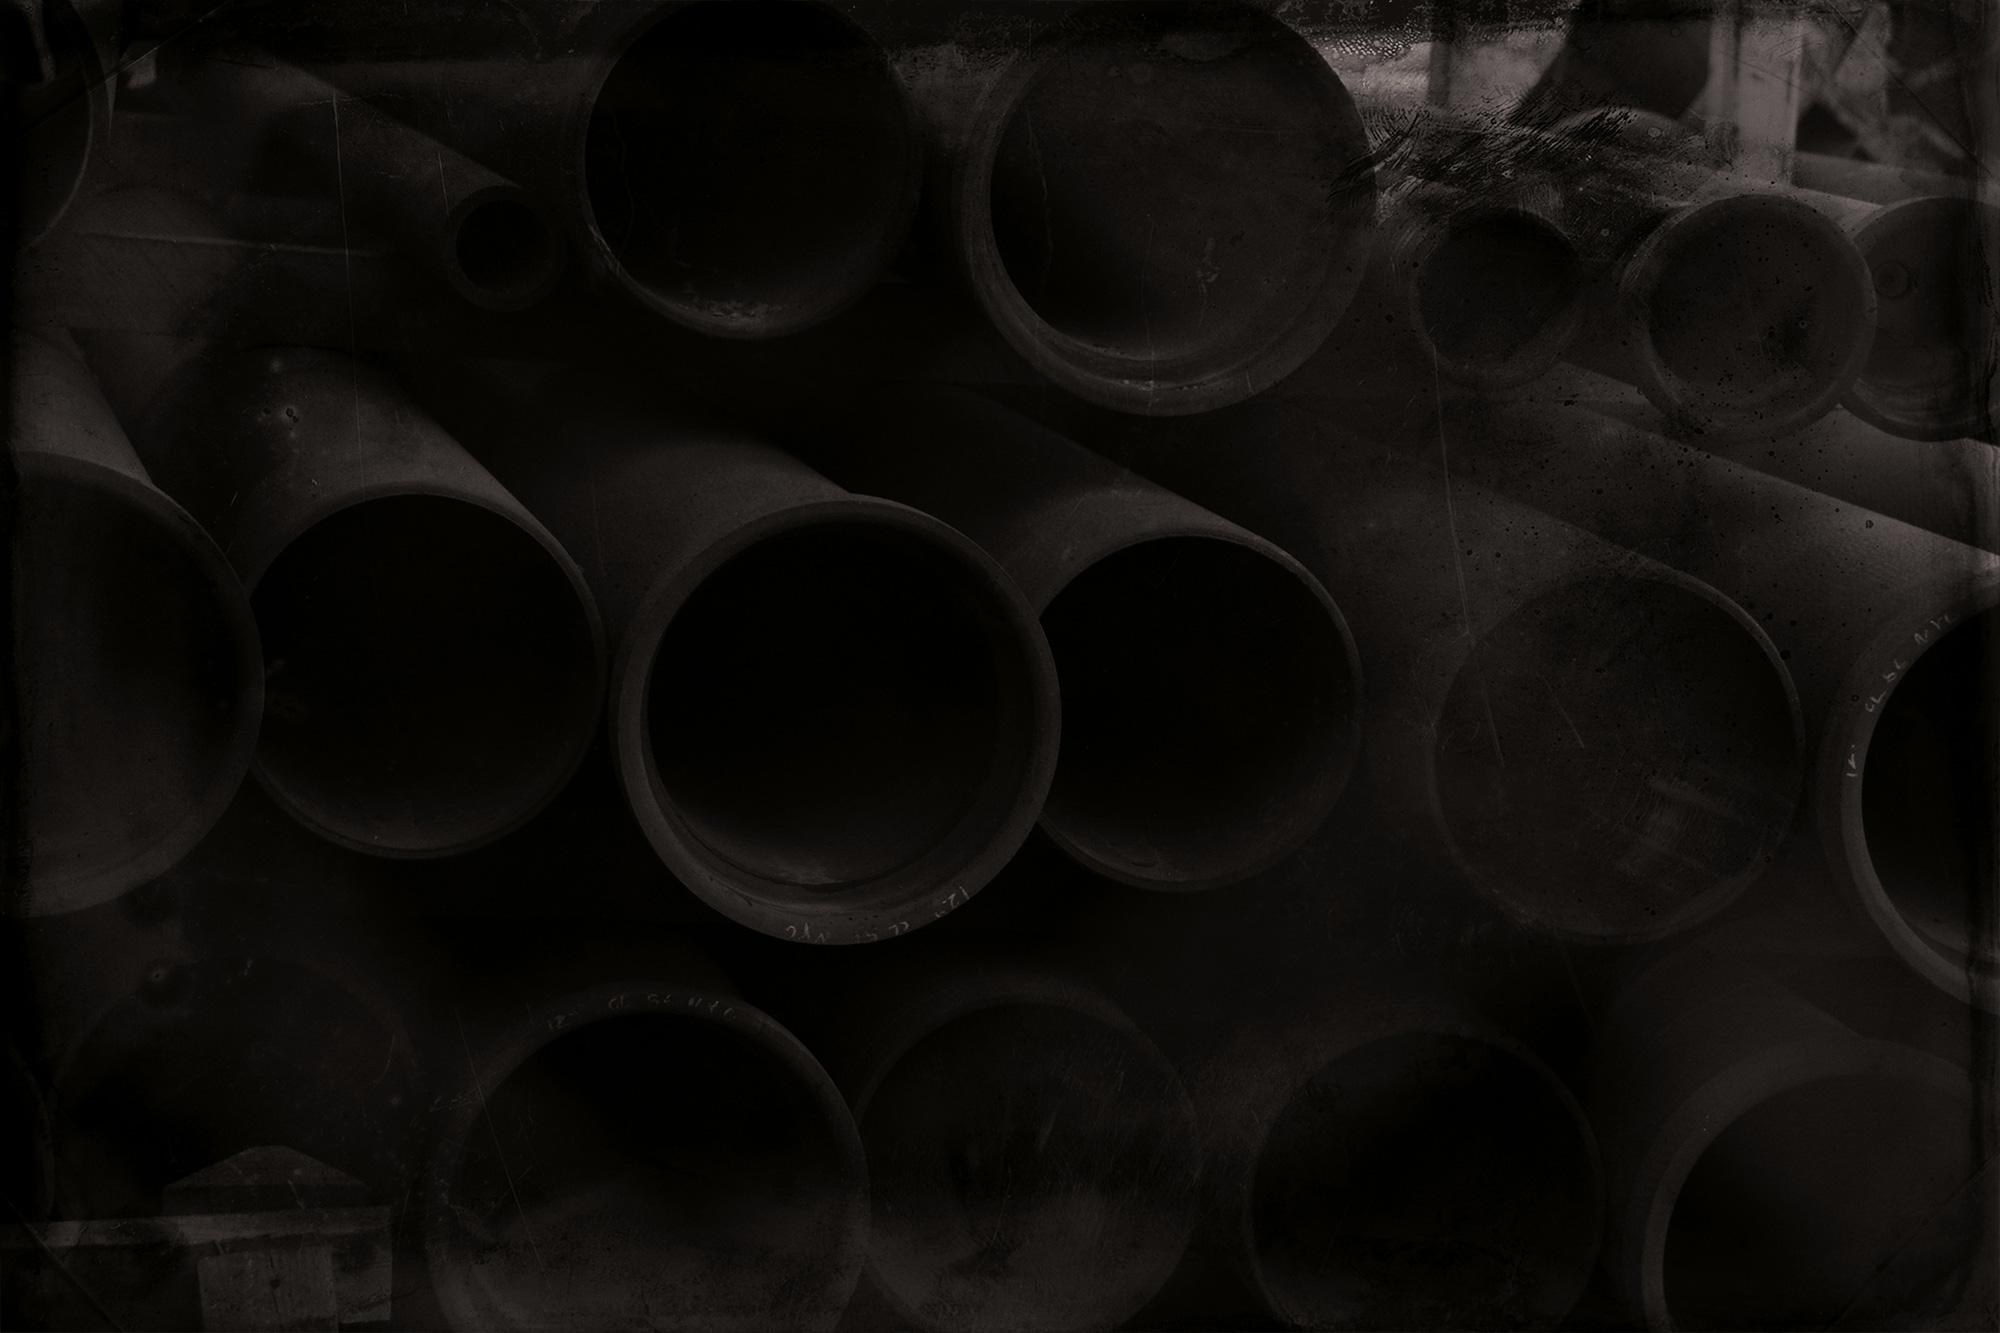 diogomontes_radiator_king_08